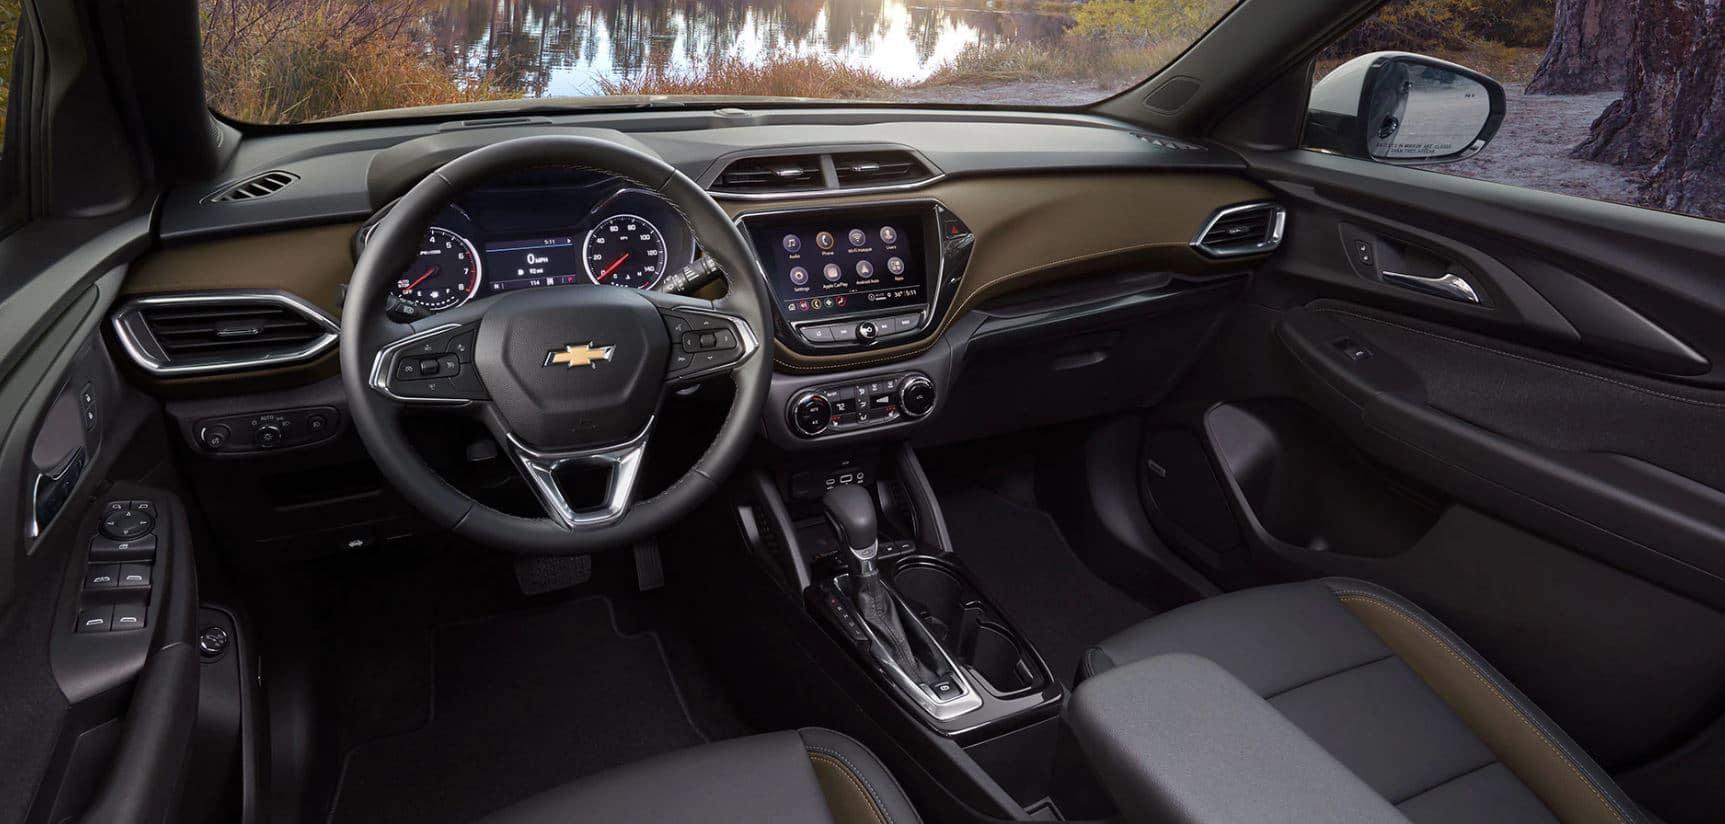 2021 chevy trailblazer interior leather trim